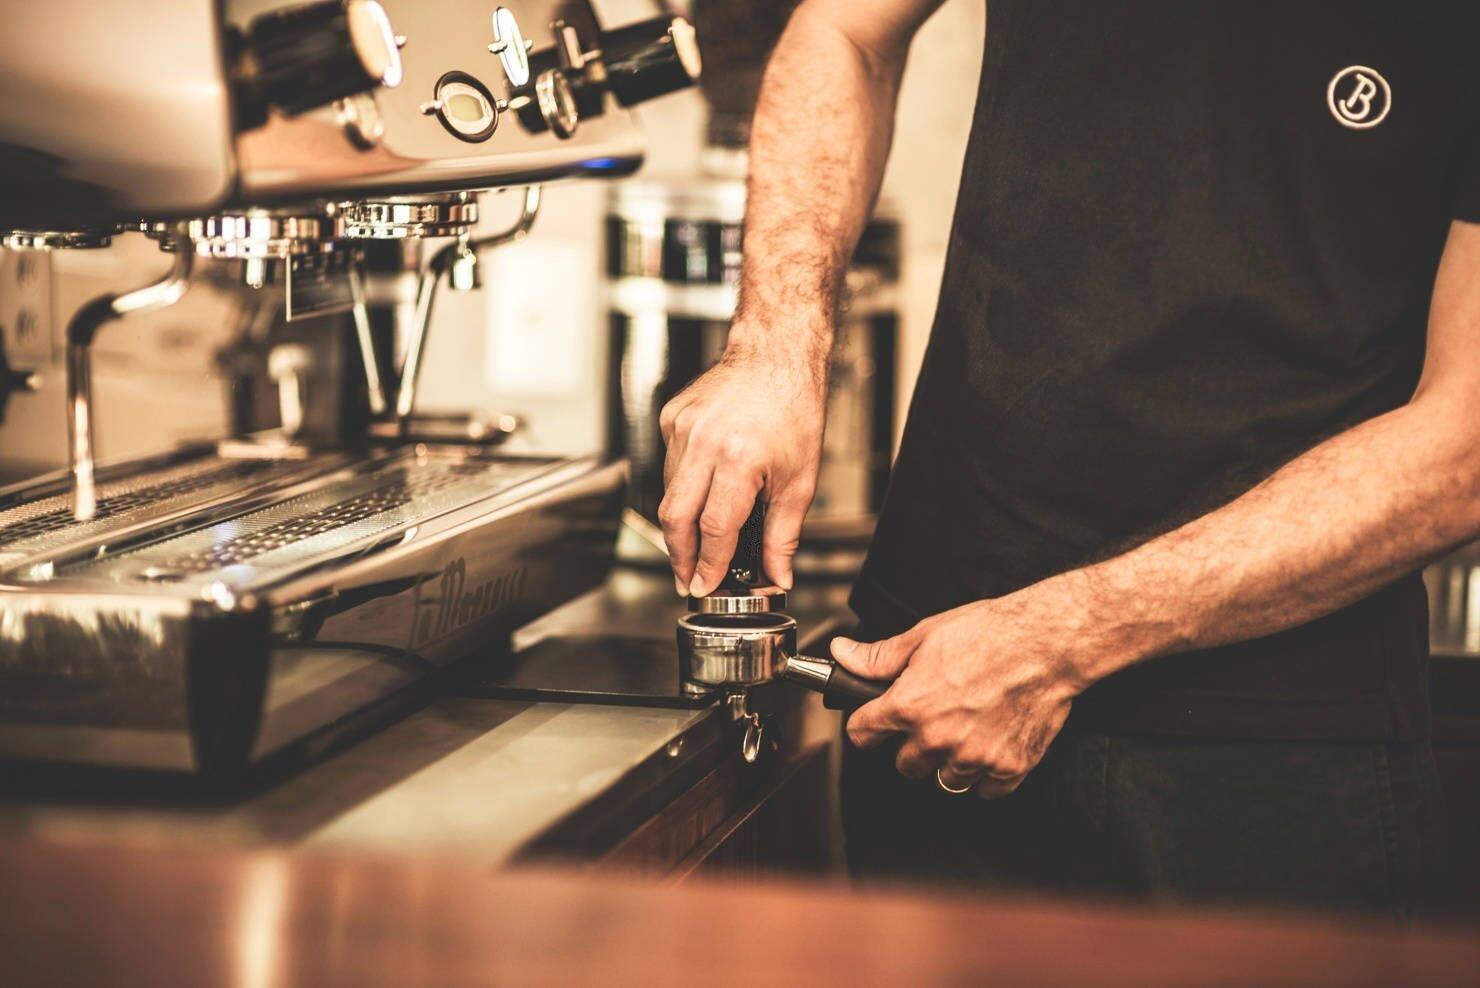 Diguo Elegance Wooden Coffee Tamper. Flat Espresso Tamper 58mm Portafilter. Stainless Steel Flat Height Adjustable Wooden Handle. Barista Espresso Tamper by Diguo (Image #7)